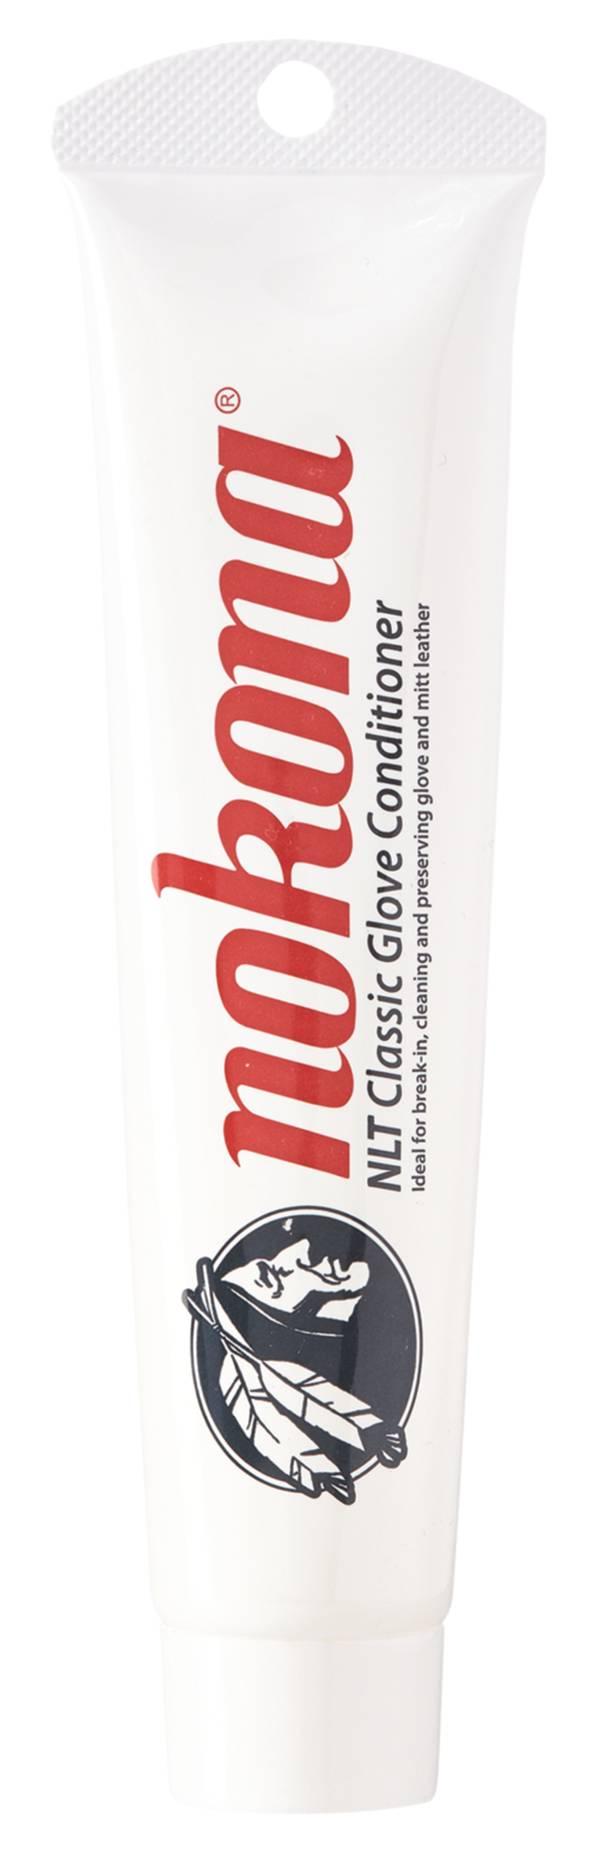 Nokona Classic Leather Glove Conditioner product image